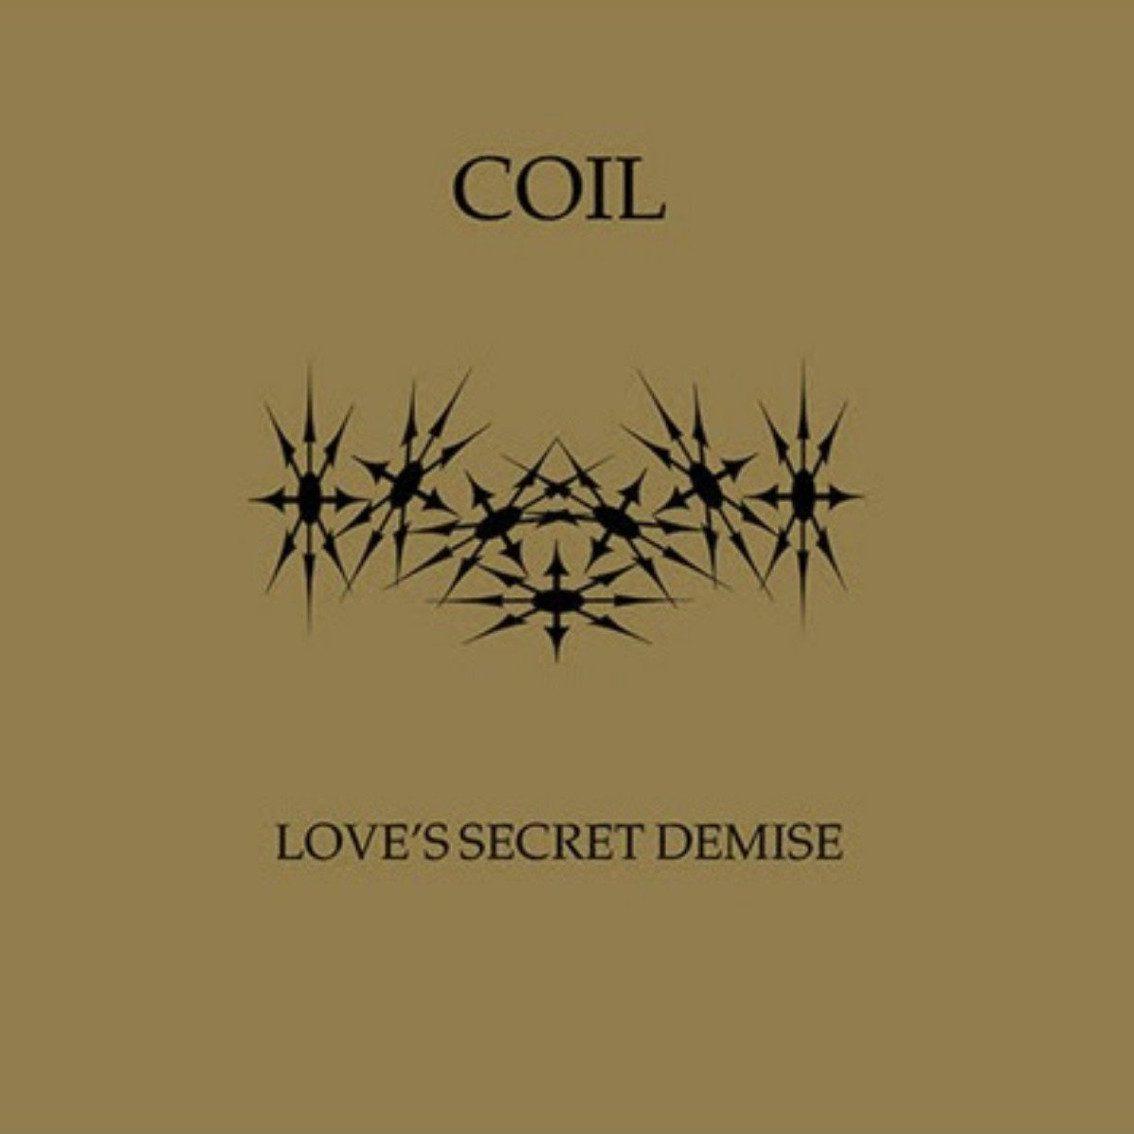 Coil's 'Love's Secret Demise' hits the CD format - order info incuded